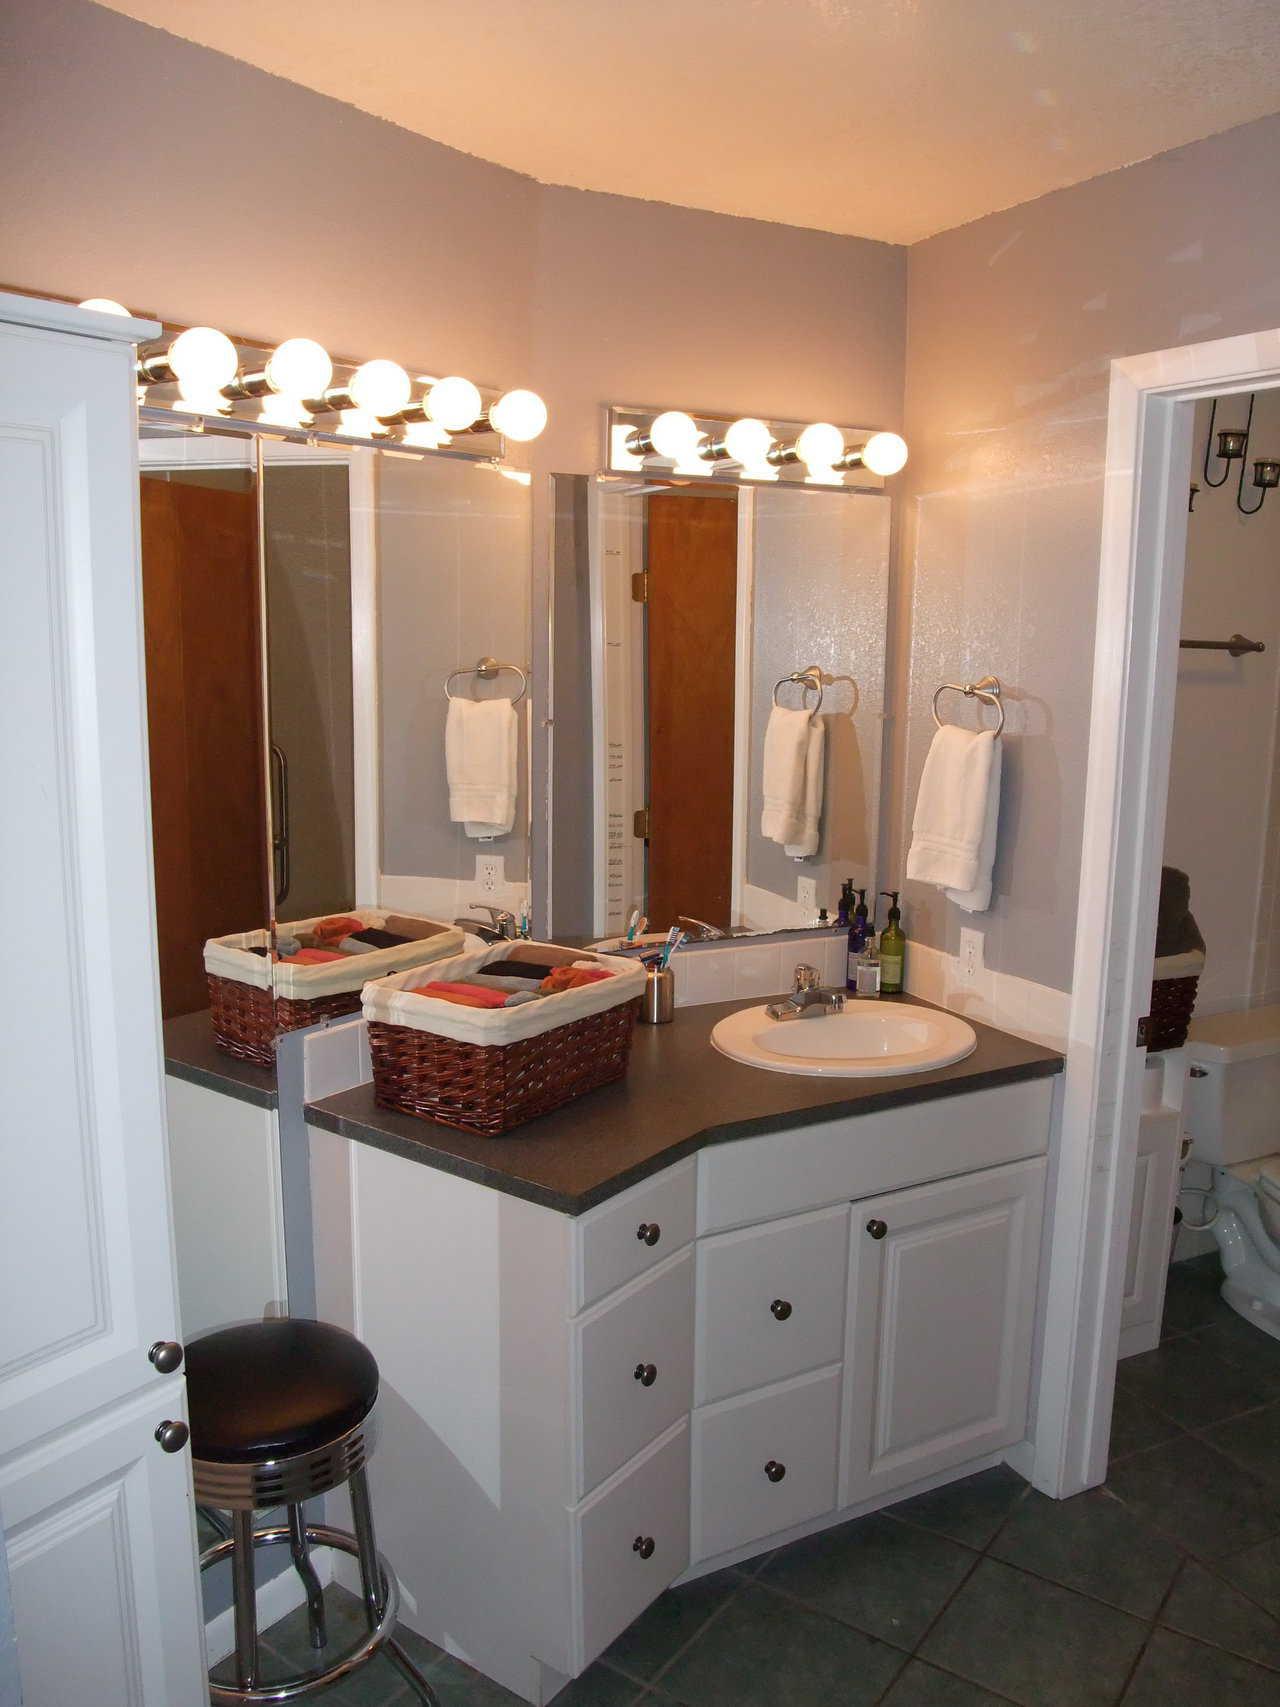 The callisto perfect design for an active family for Economic bathroom designs